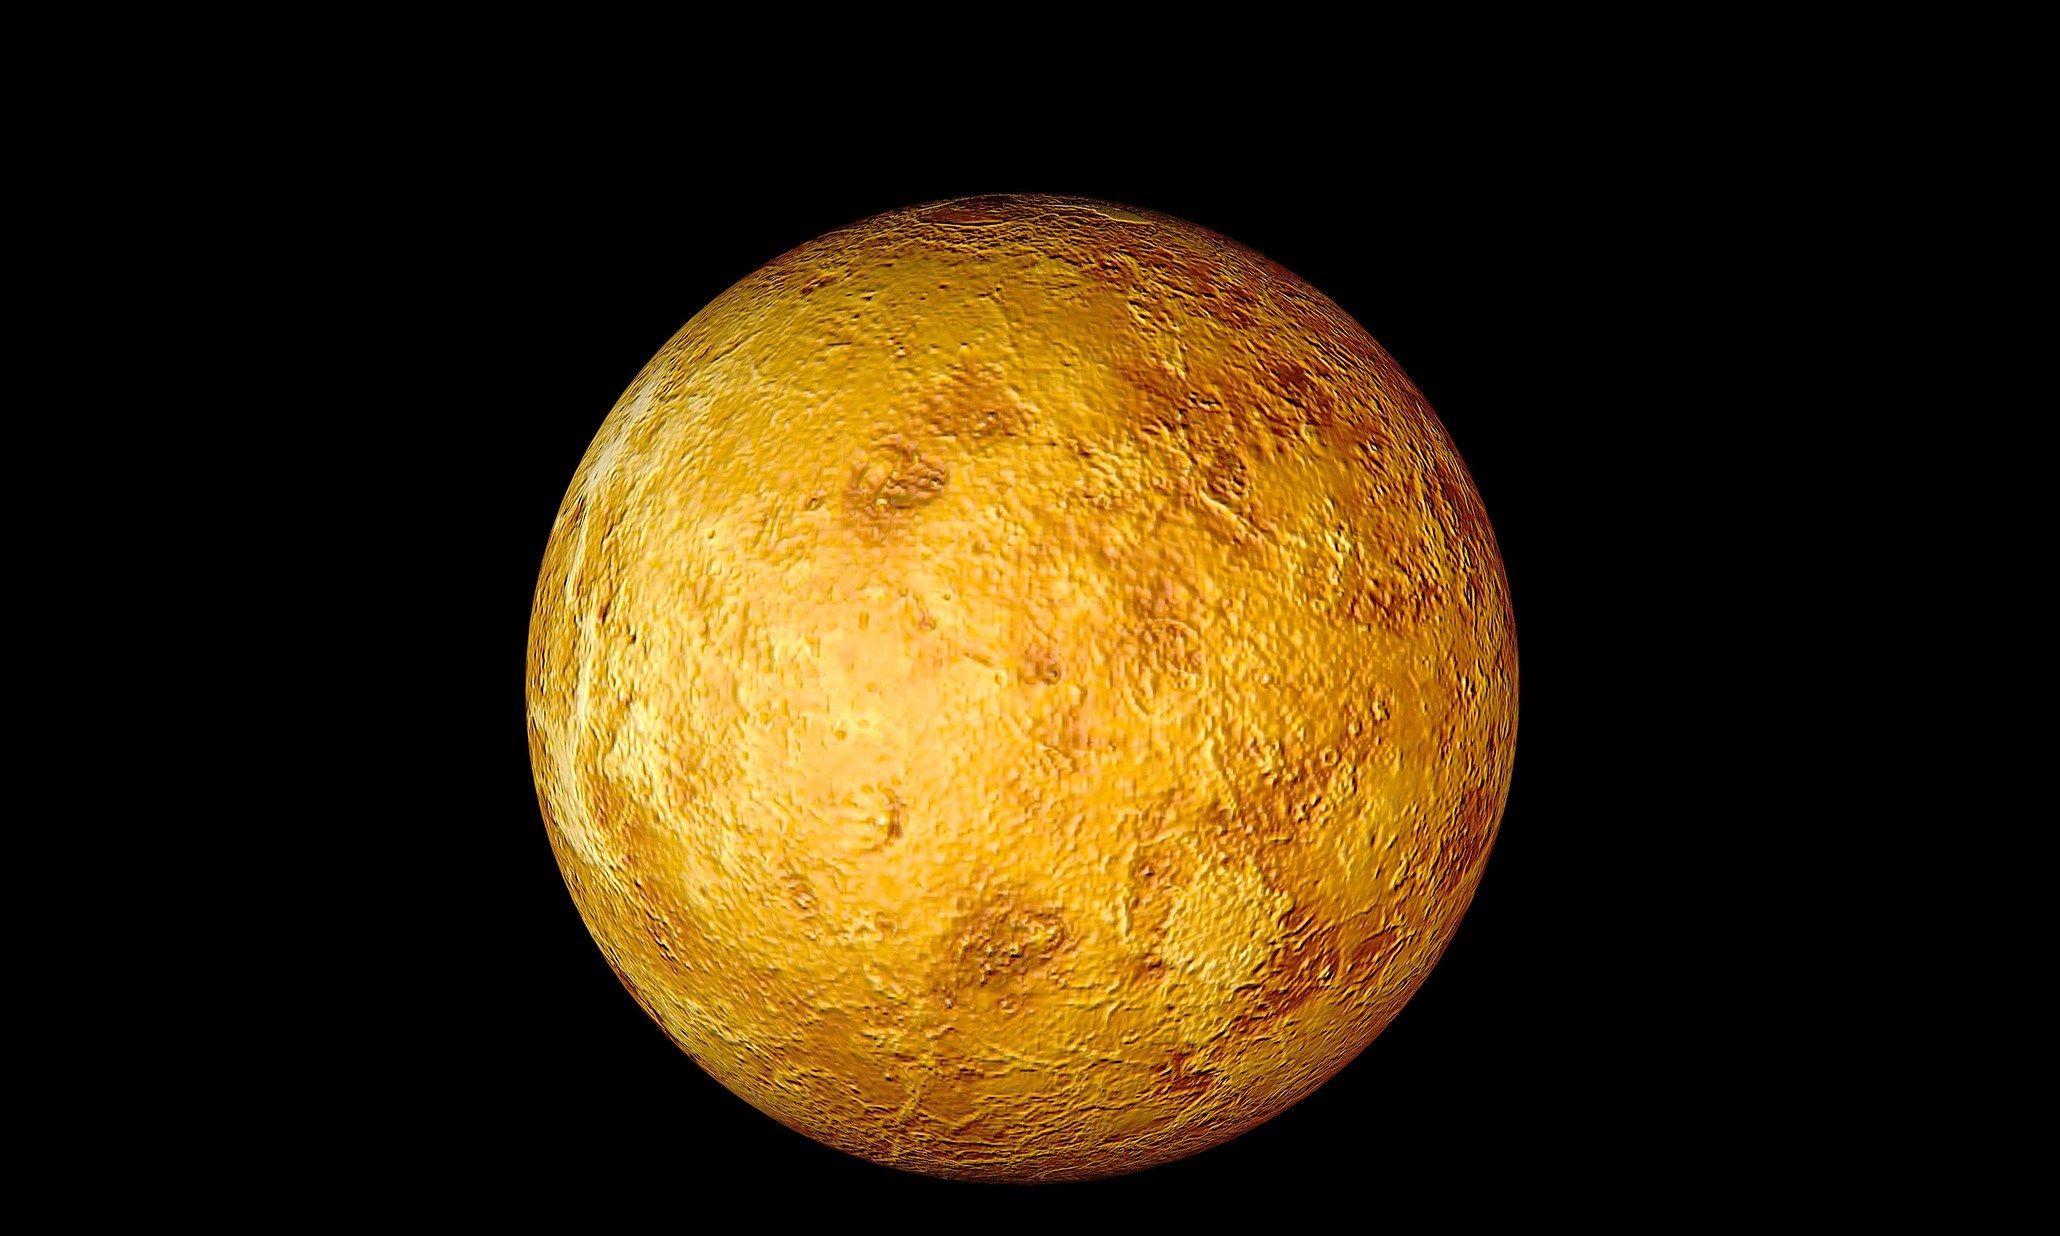 Venus hd wallpaper ololoshenka pinterest hd wallpaper and venus venus hd wallpaper voltagebd Image collections